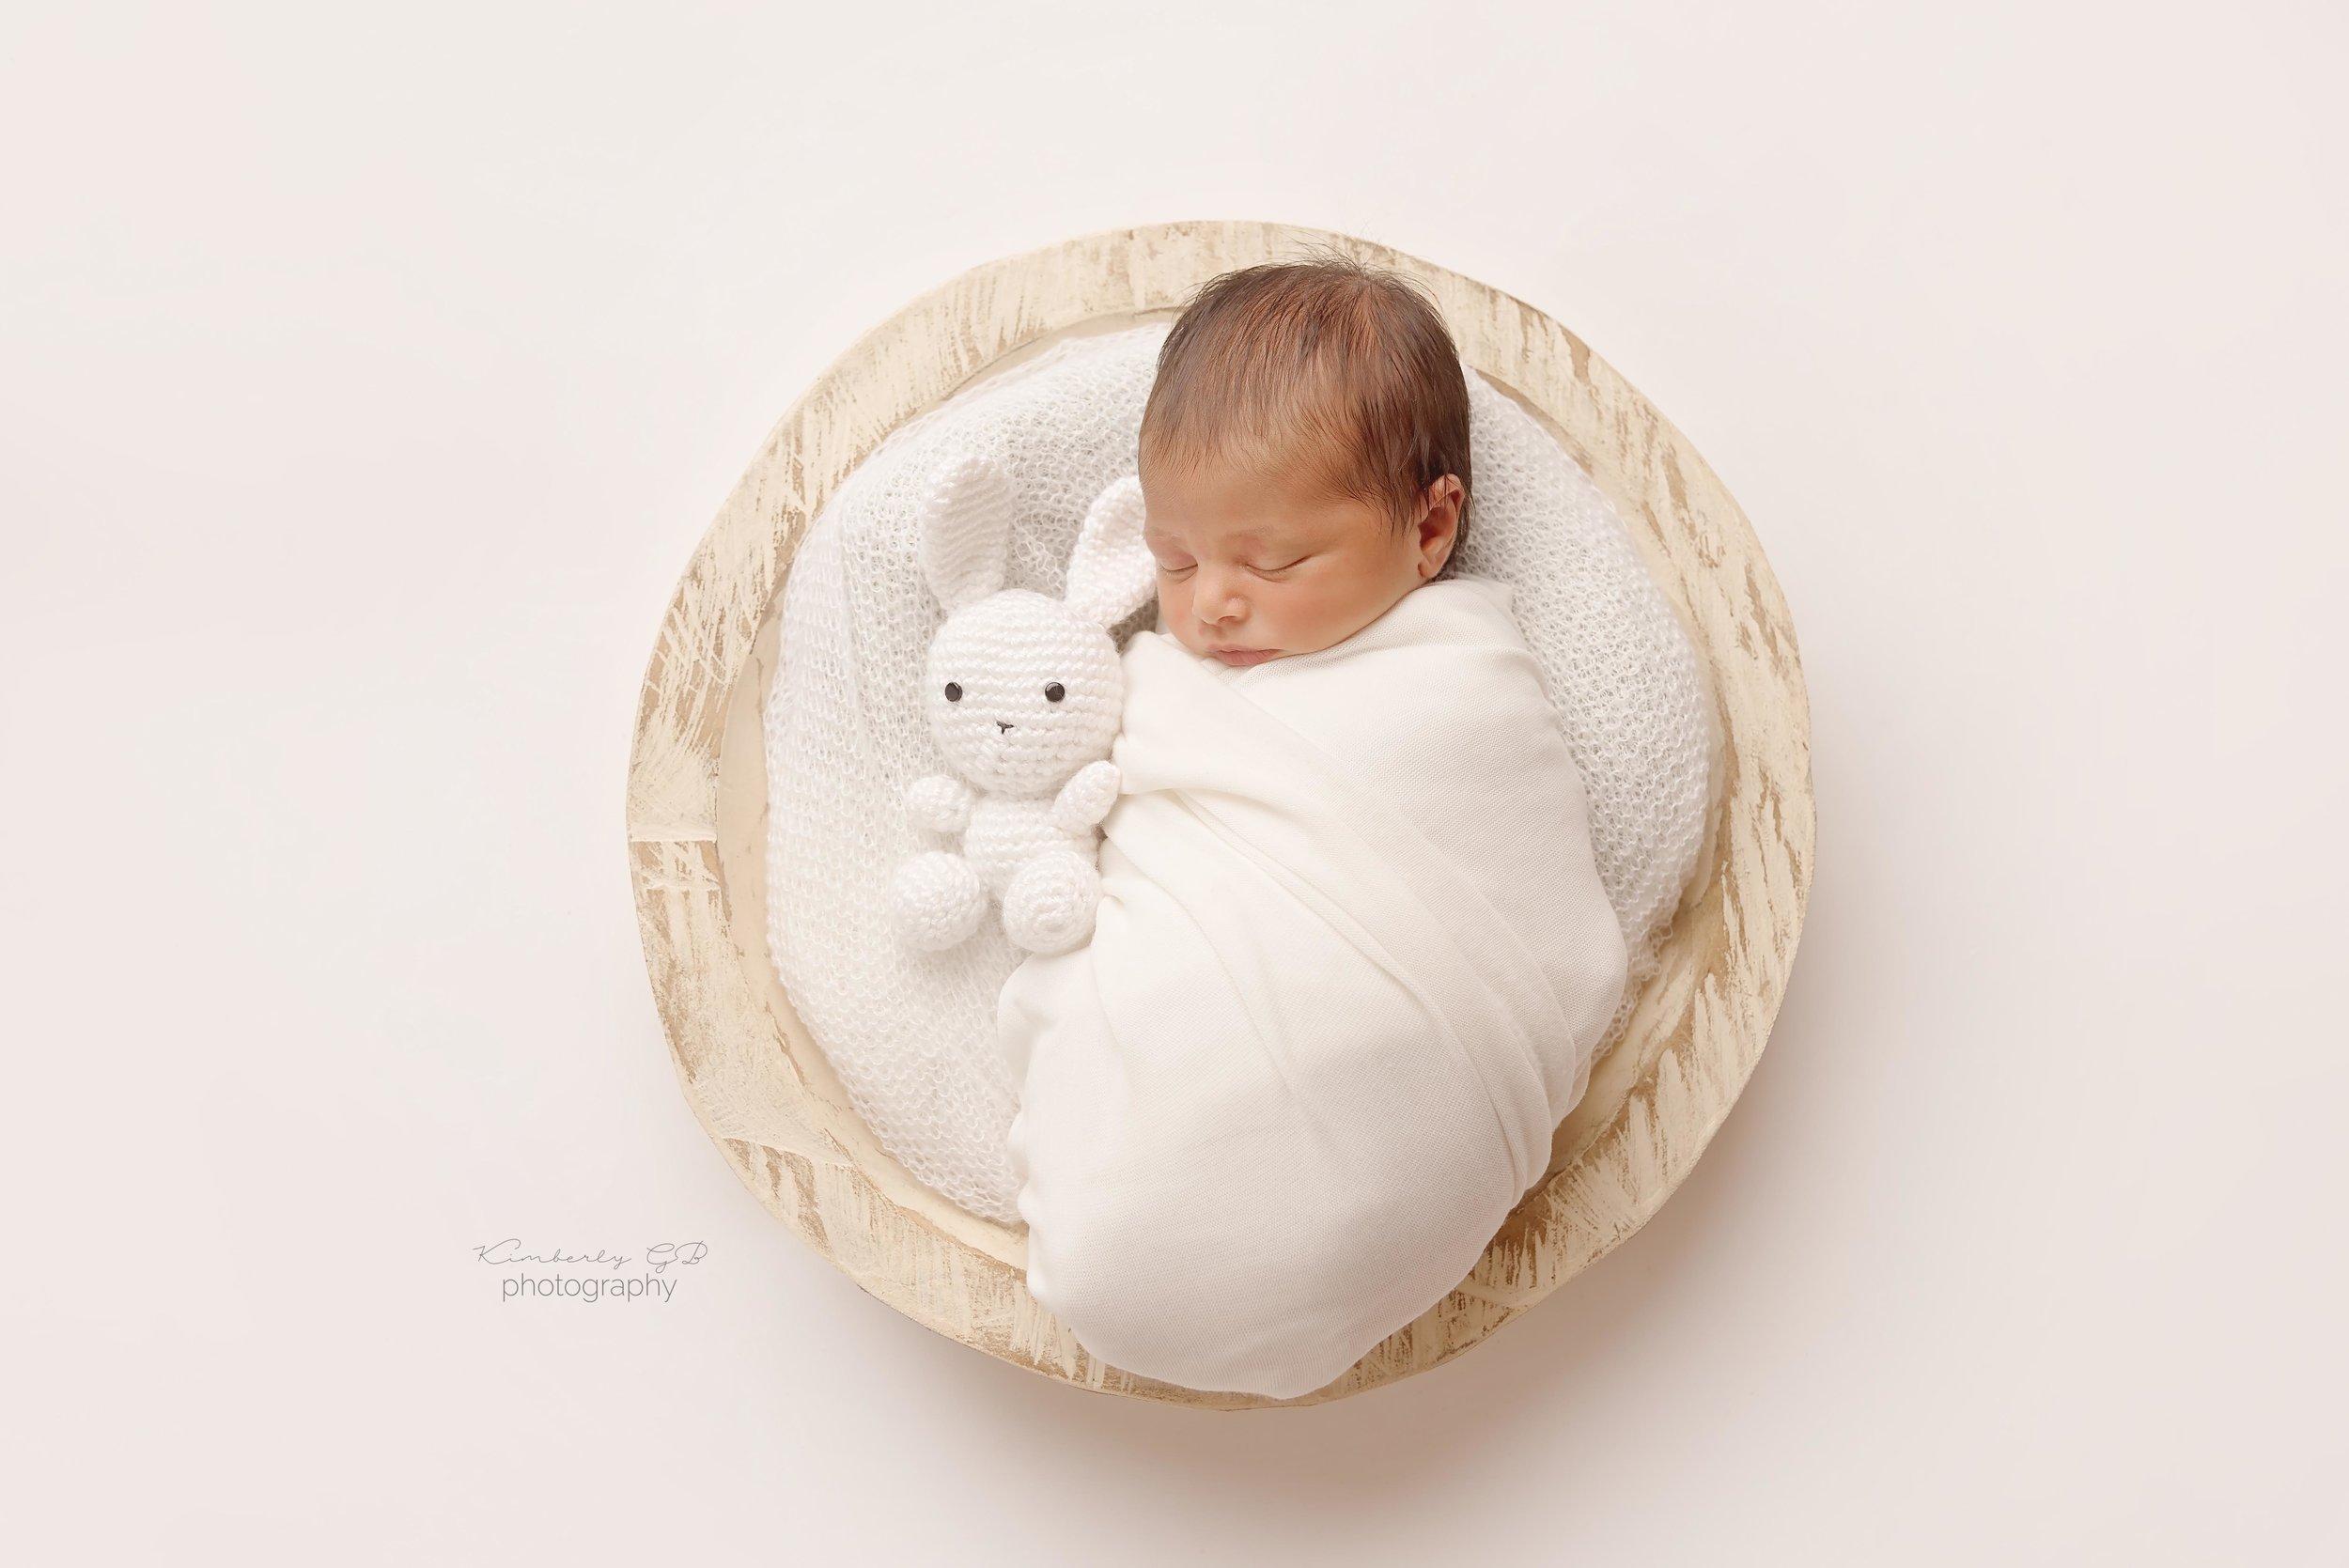 fotografia-de-recien-nacidos-bebes-newborn-en-puerto-rico-kimberly-gb-photography-fotografa-144.jpg